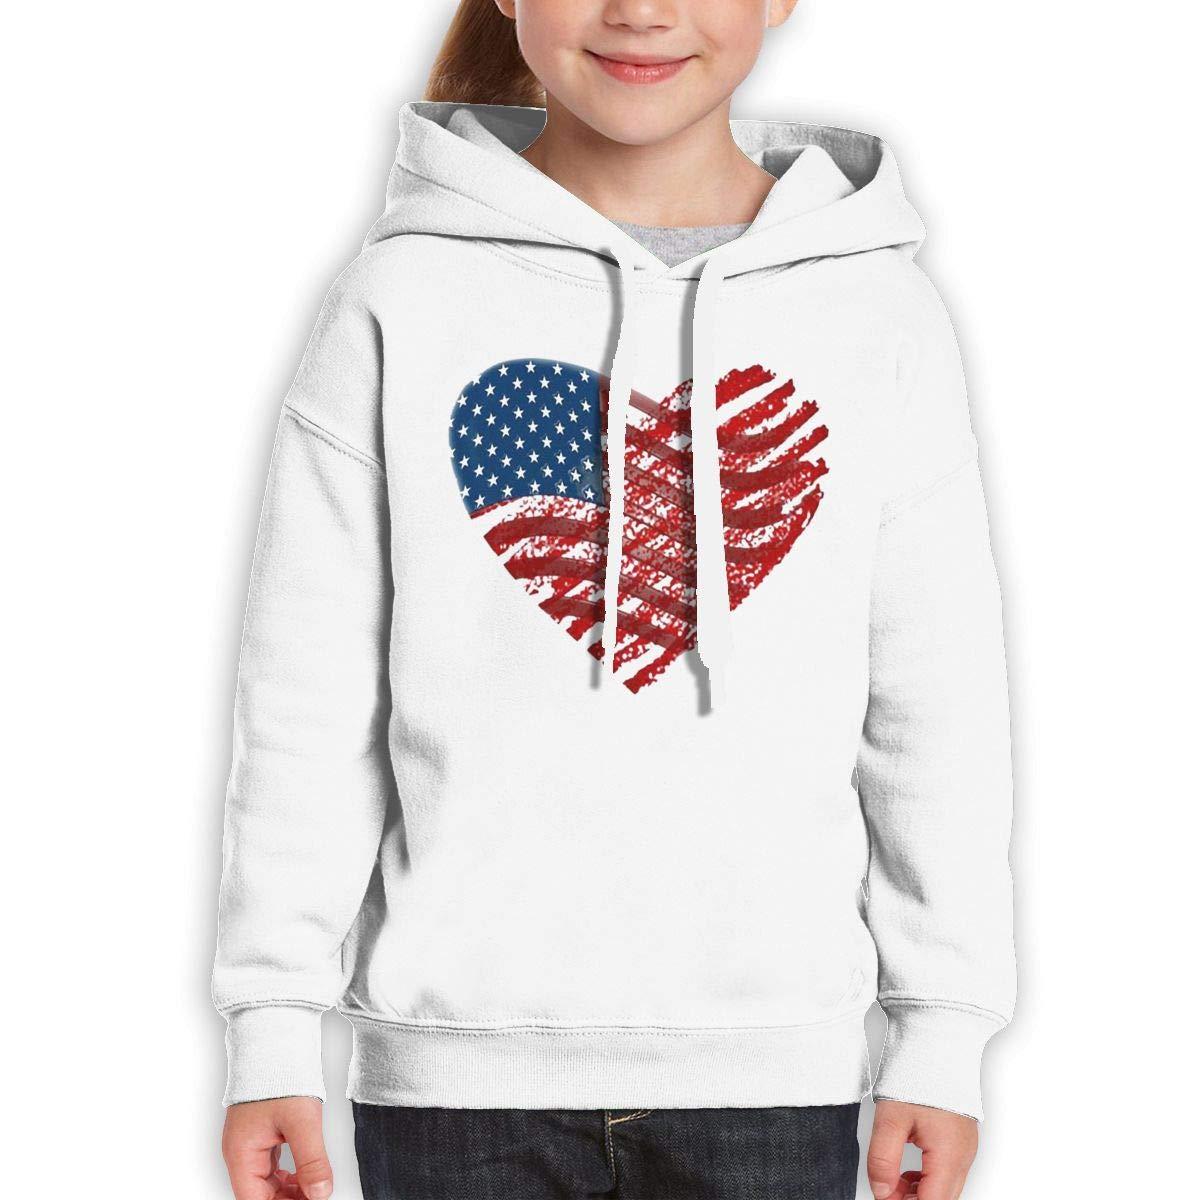 Xxxx Dtjscl Boys Girls American Flag Heart Teen Youth Fleeces Black